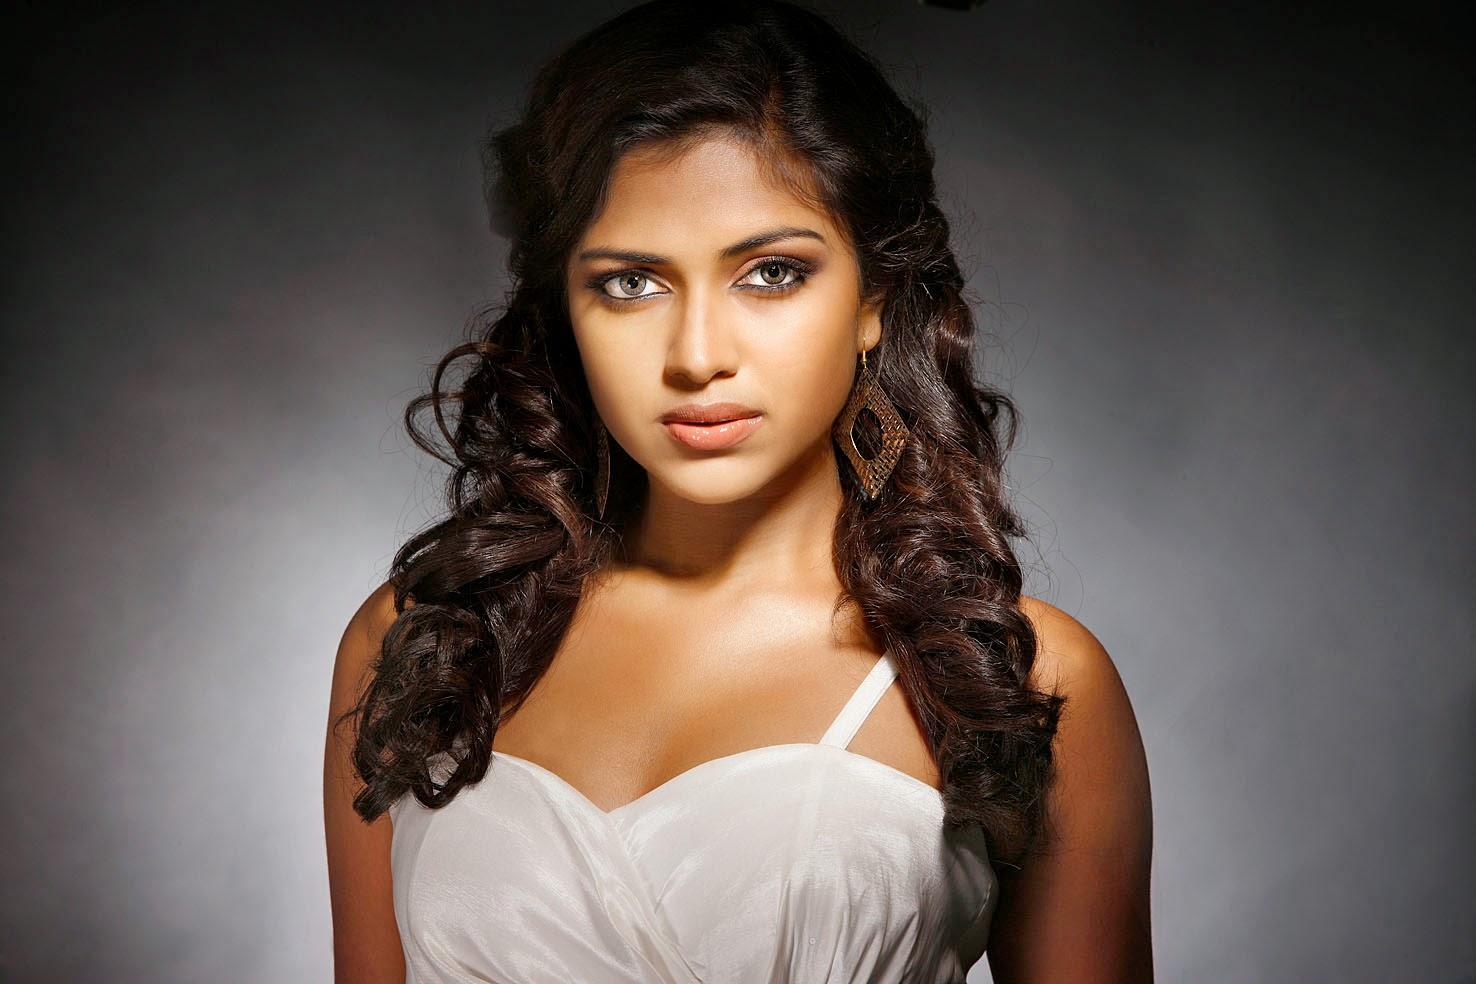 Amala Paul Sex Images south indian actress amala paul hd wallpapers i - amala paul